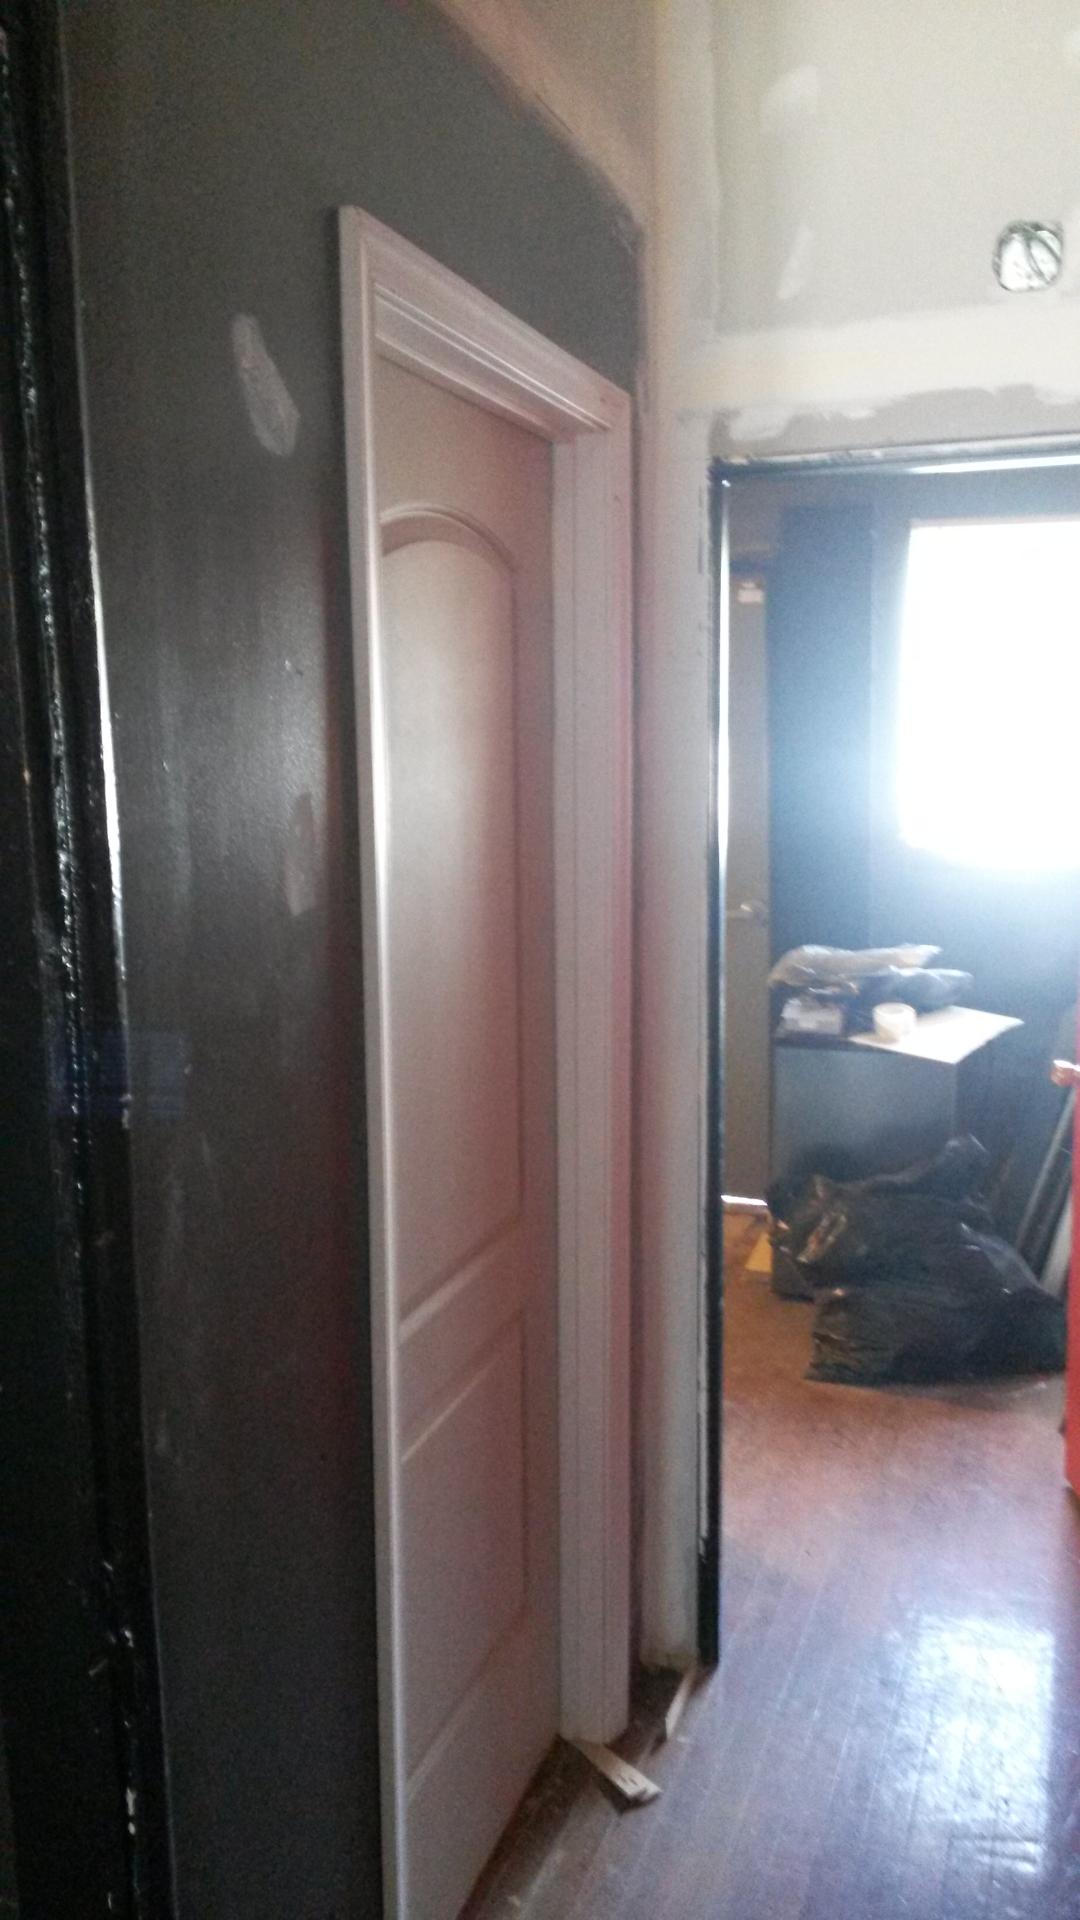 restaurant ada restroom (closet to bath)8_edited.jpg